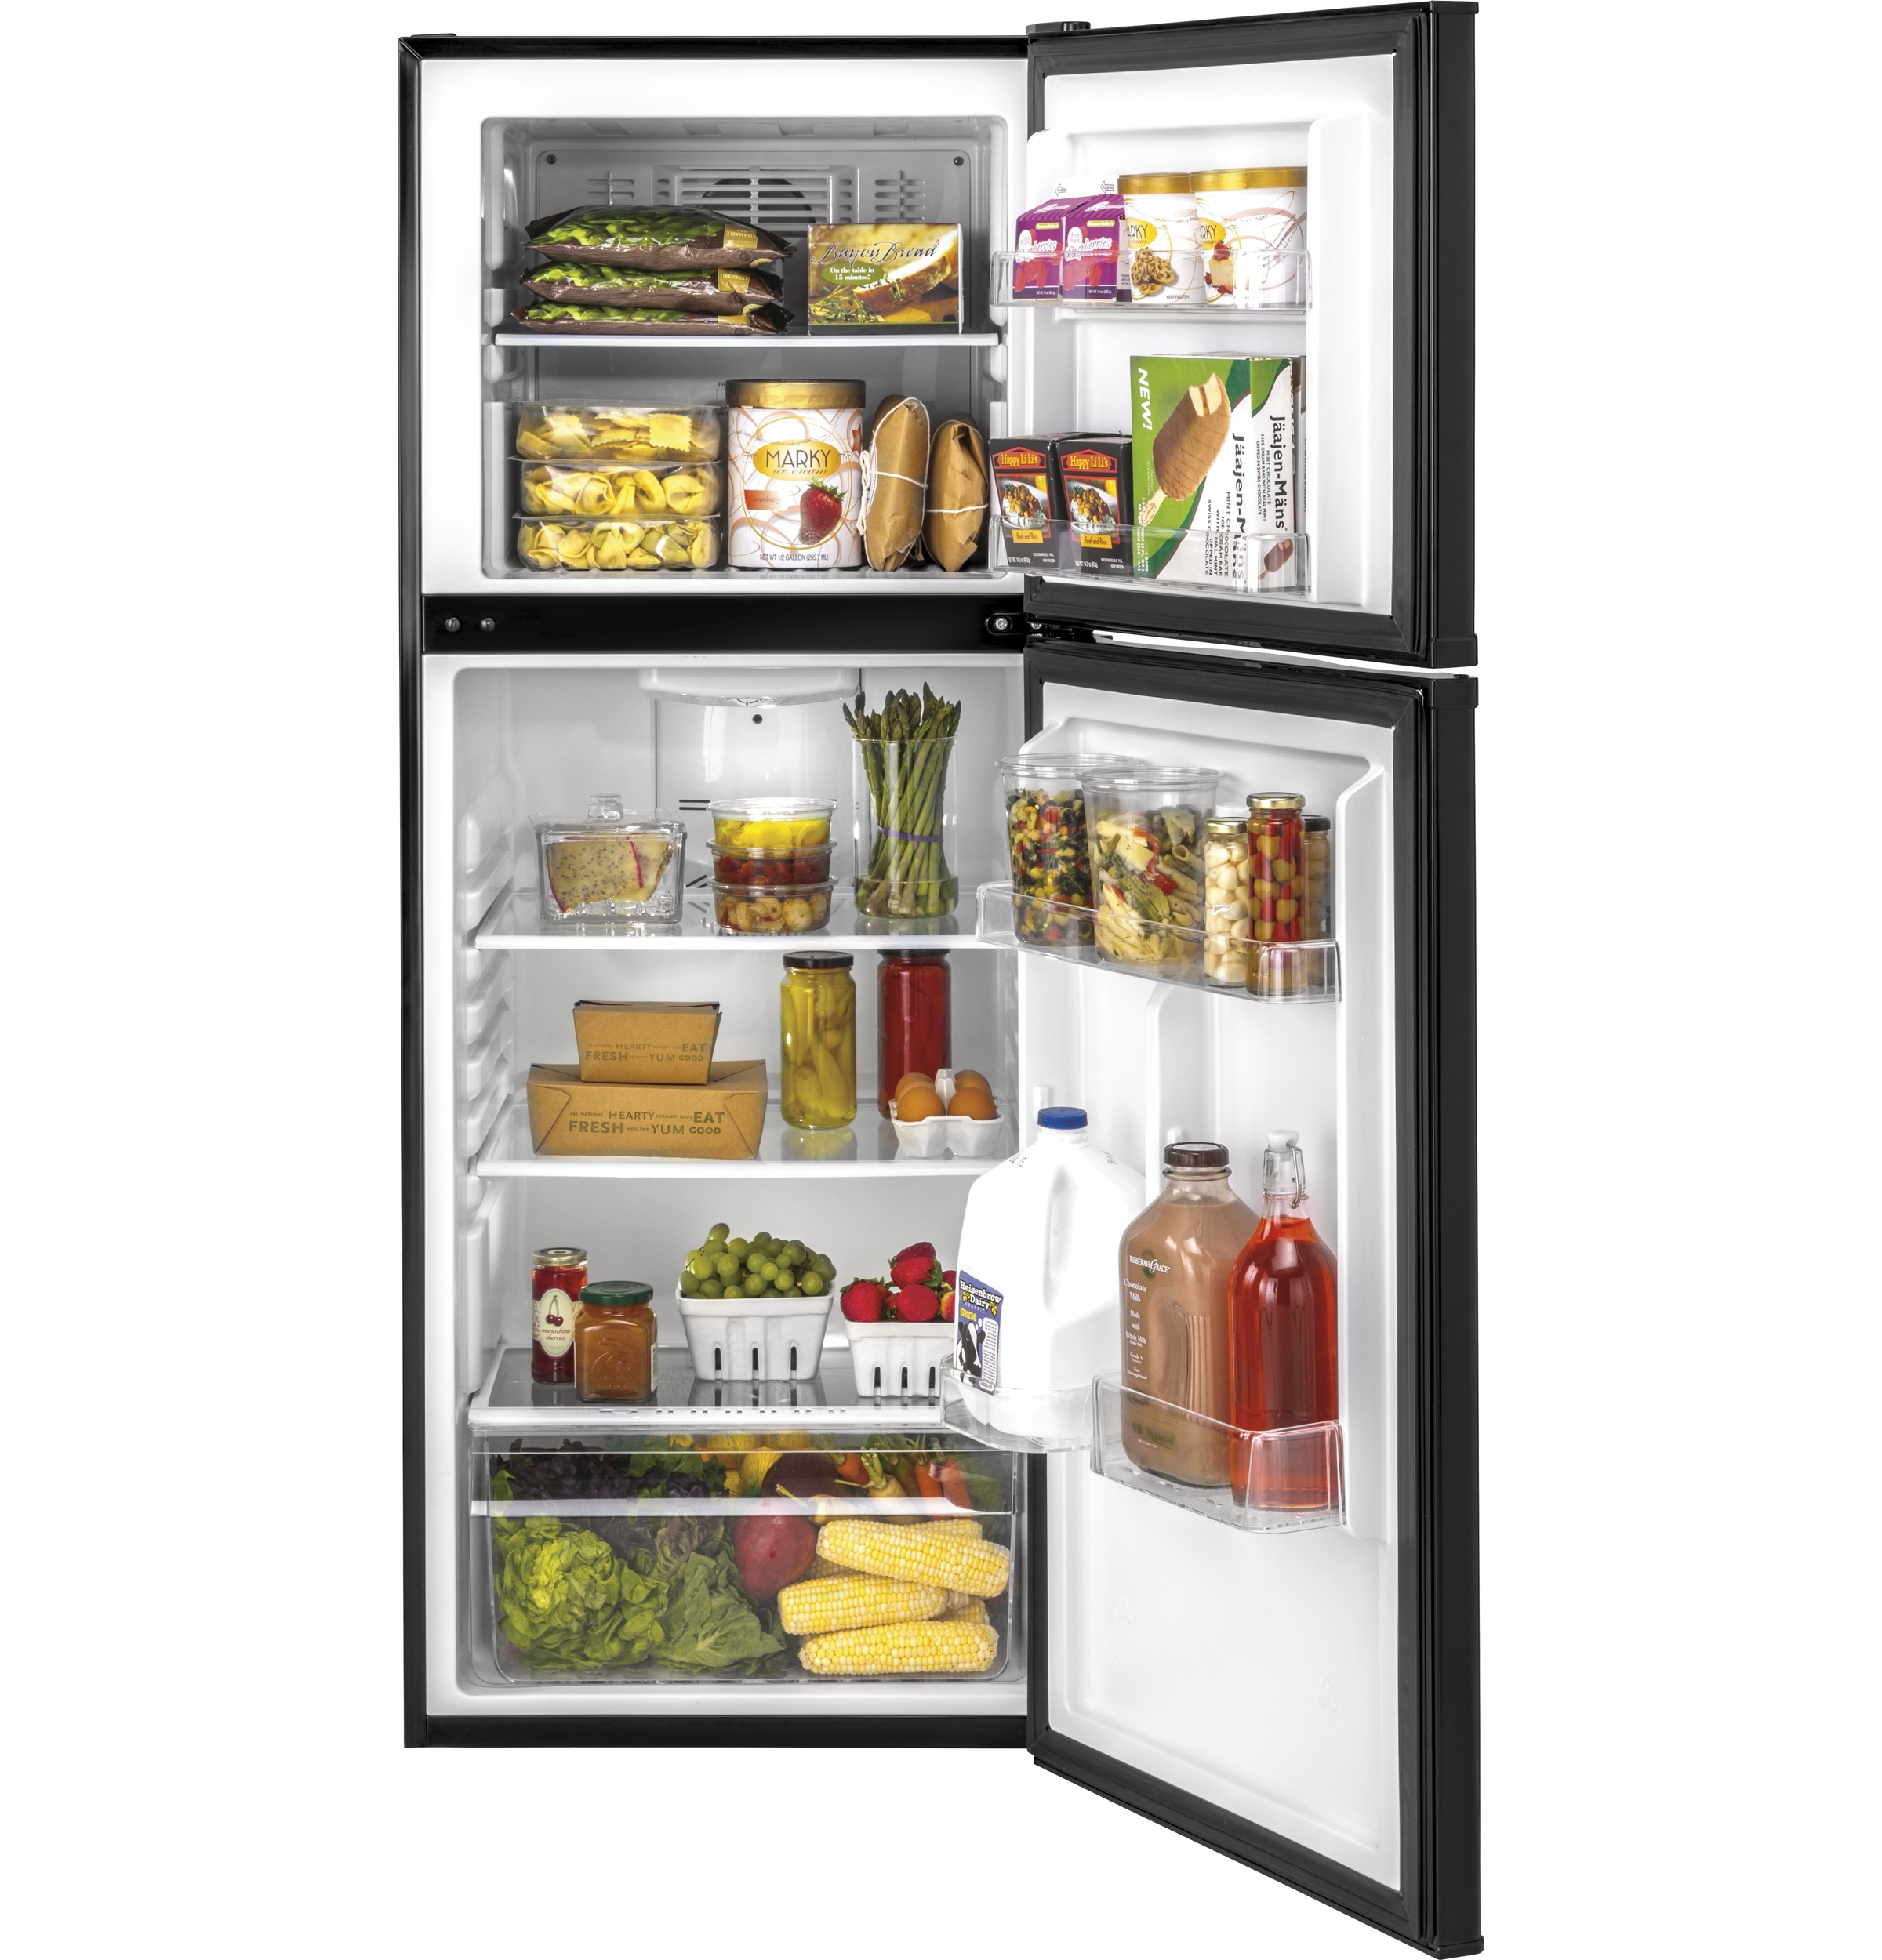 Model: HA10TG21SB | Haier 9.8 Cu. Ft. Top Freezer Refrigerator